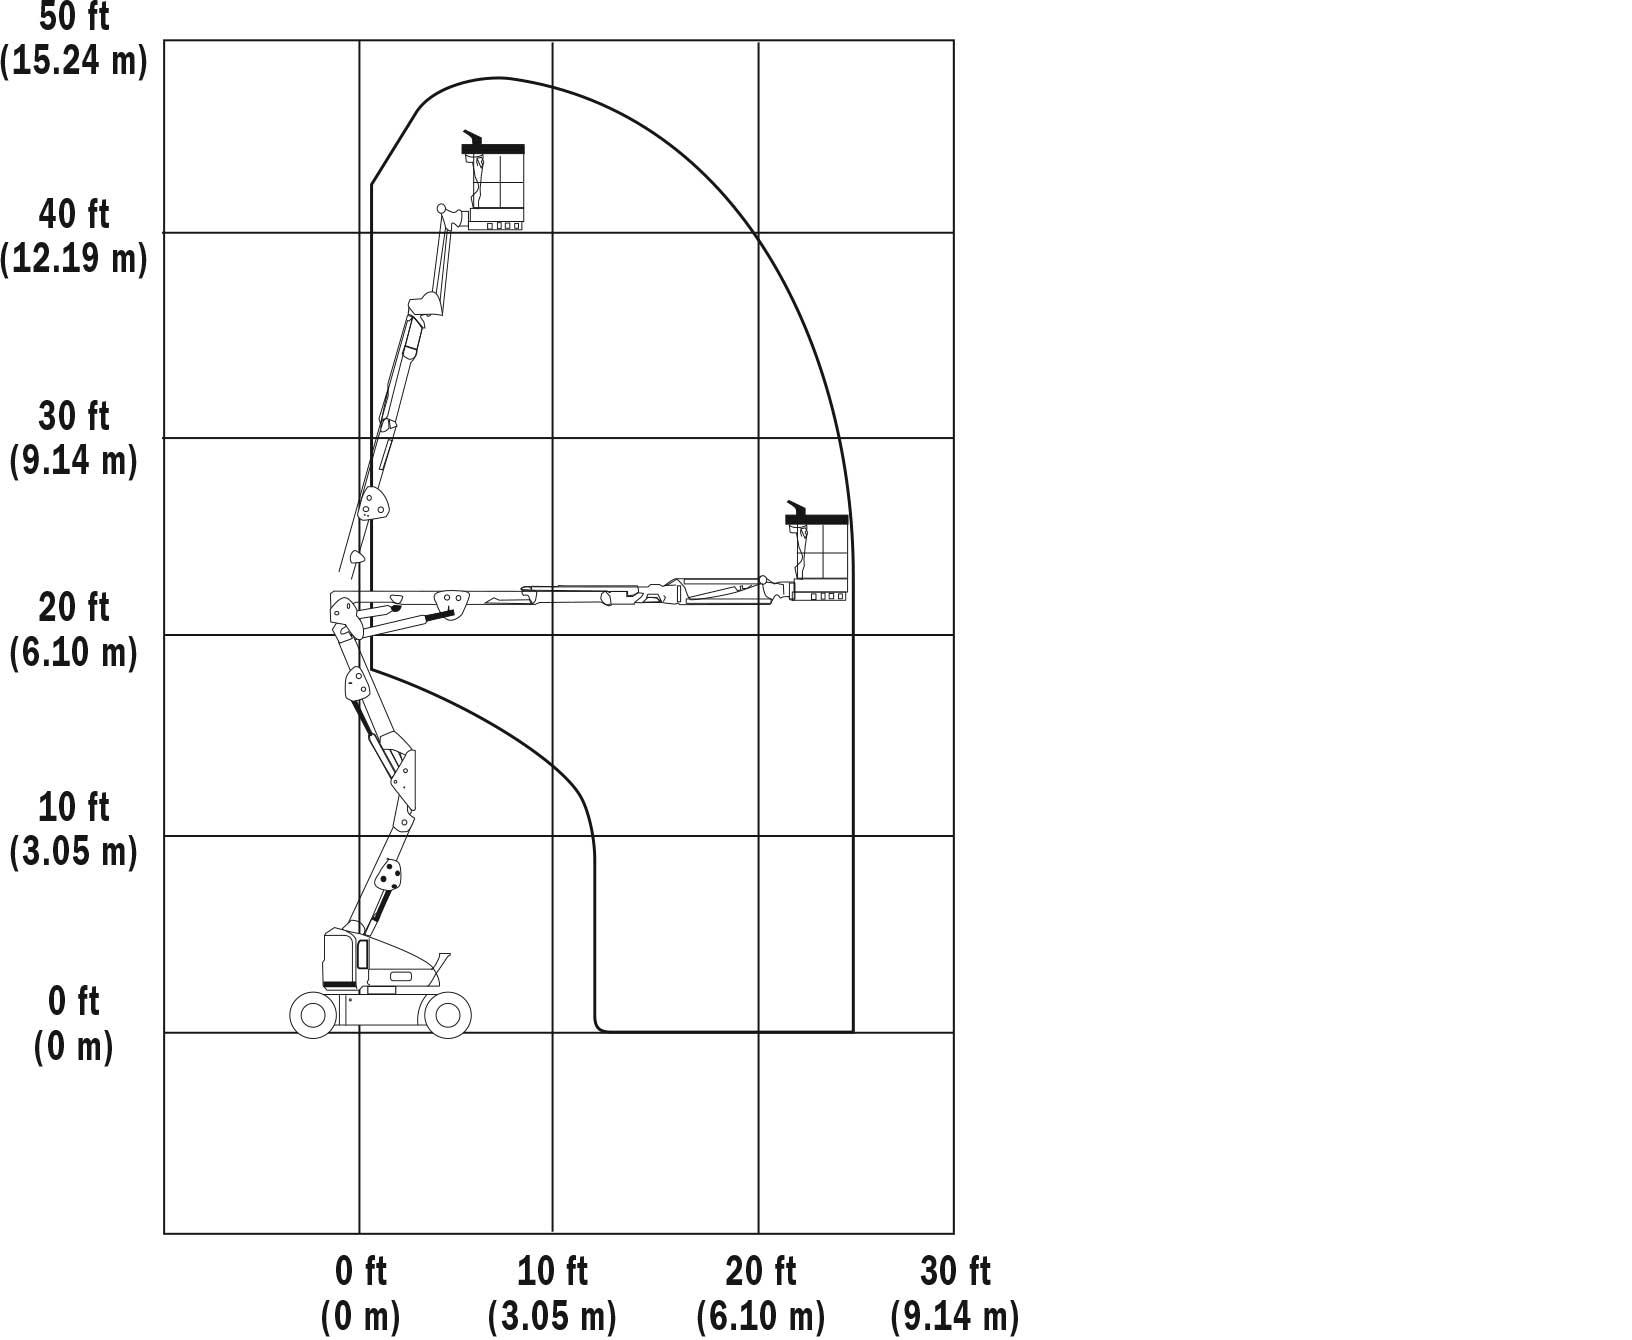 E400AJP Reach Diagram